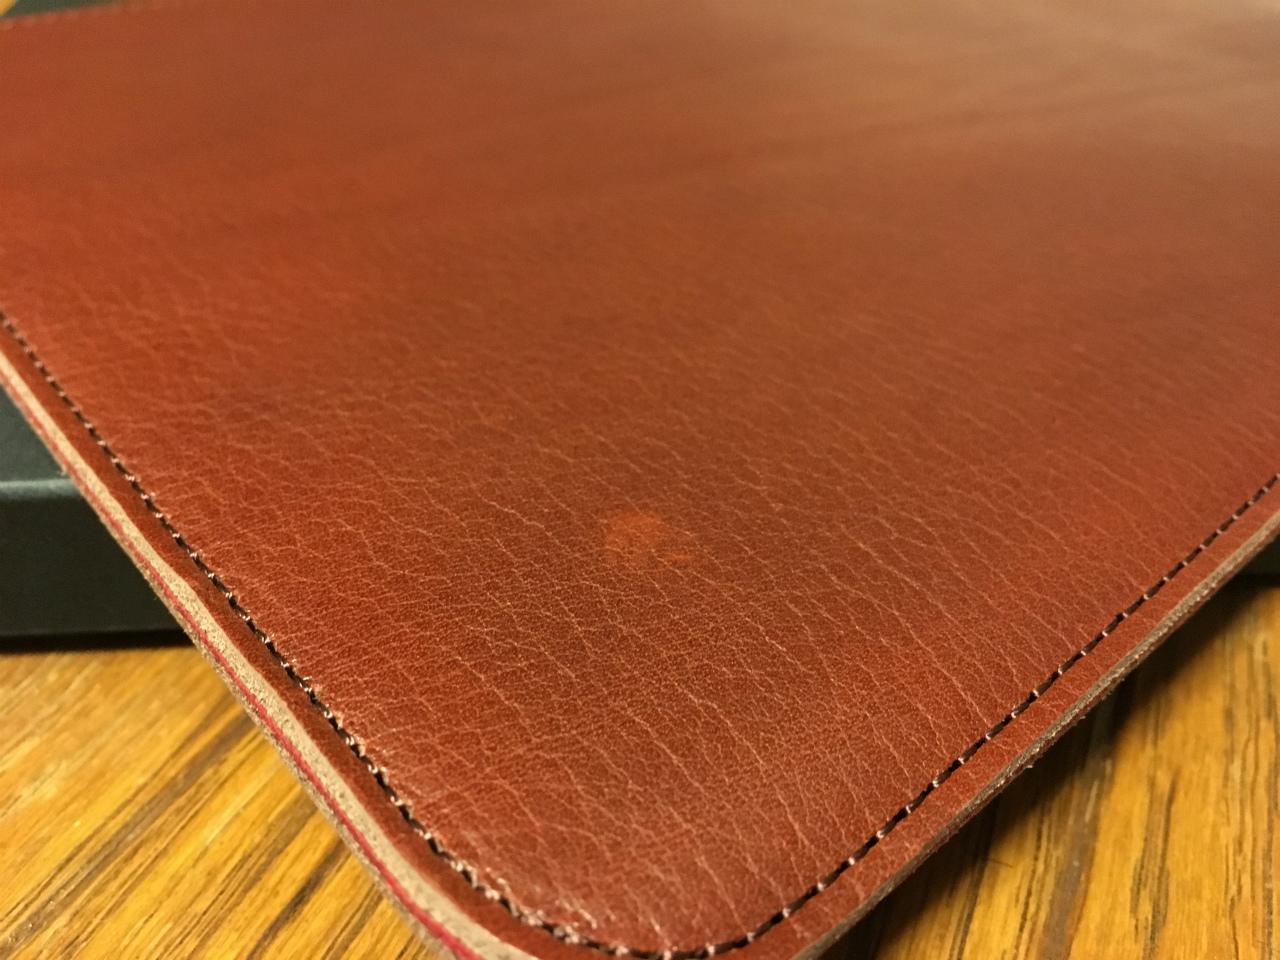 kunitachi-leather-sleeve-for-ipadpro-03